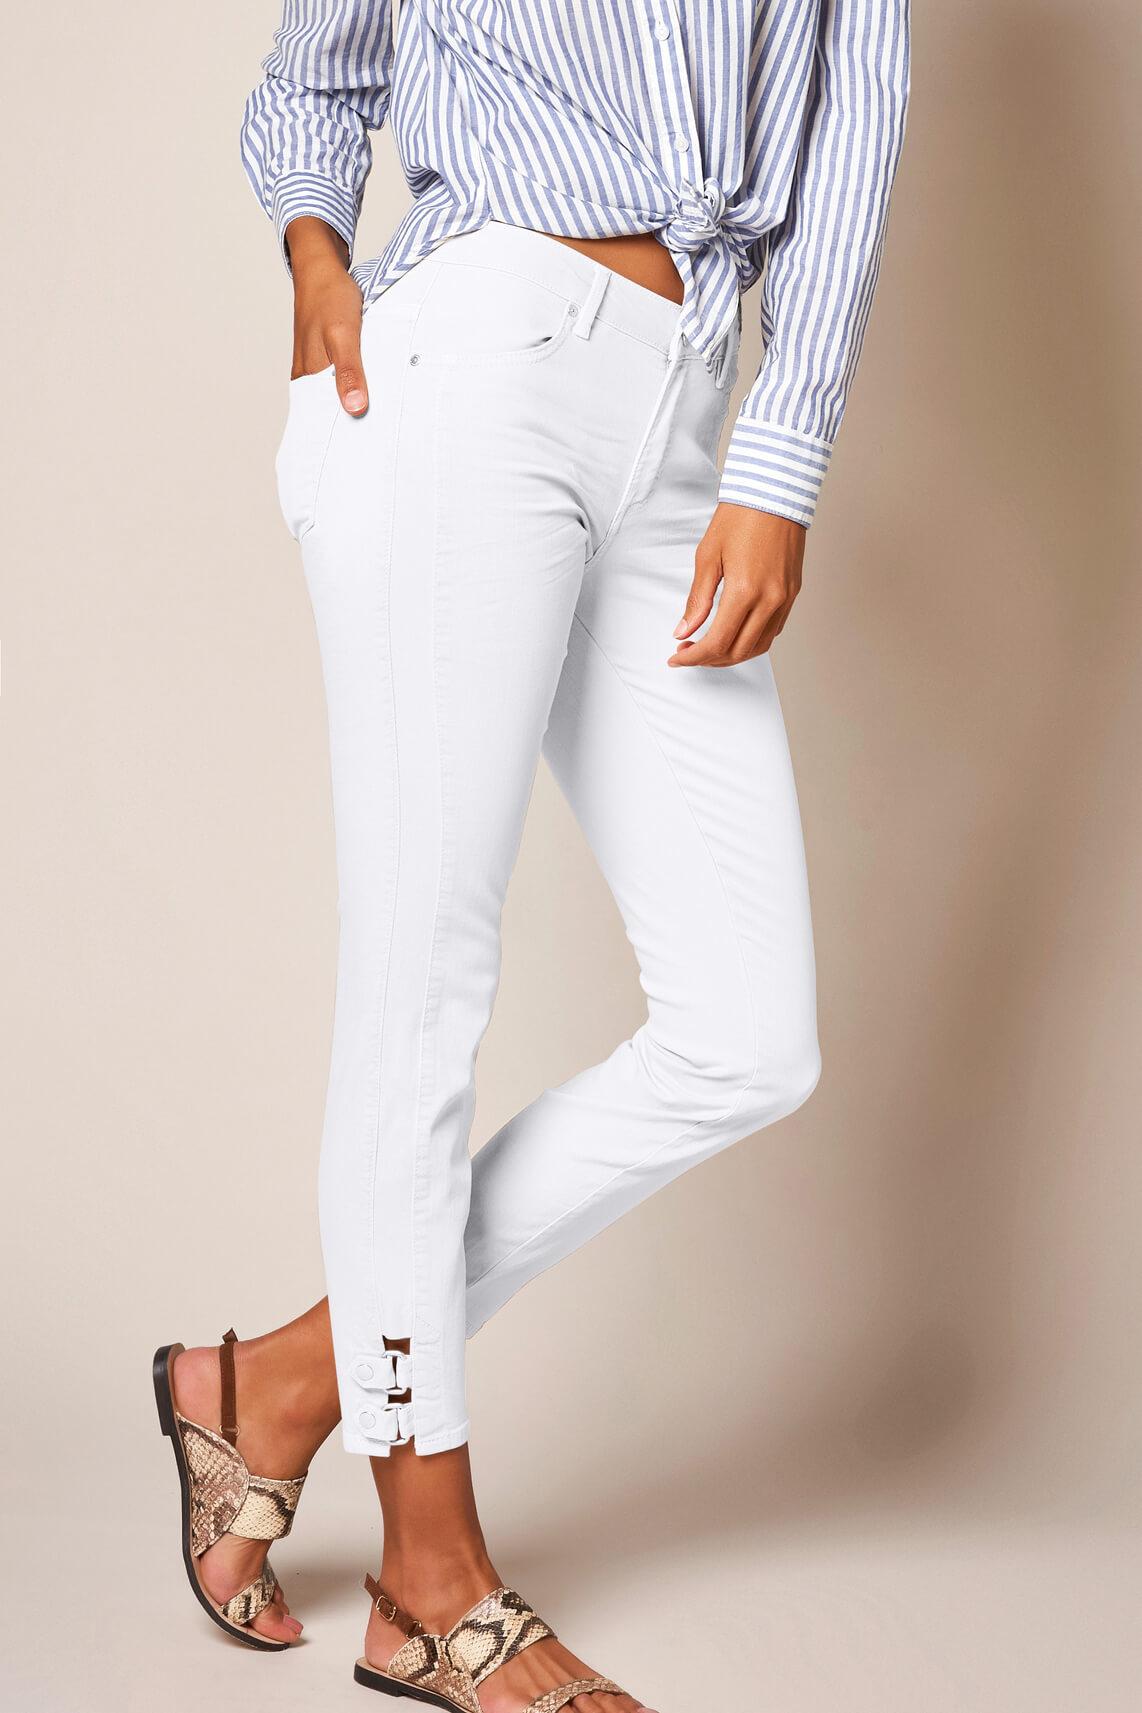 Rosner Dames L28 Antonia jeans met gesp wit